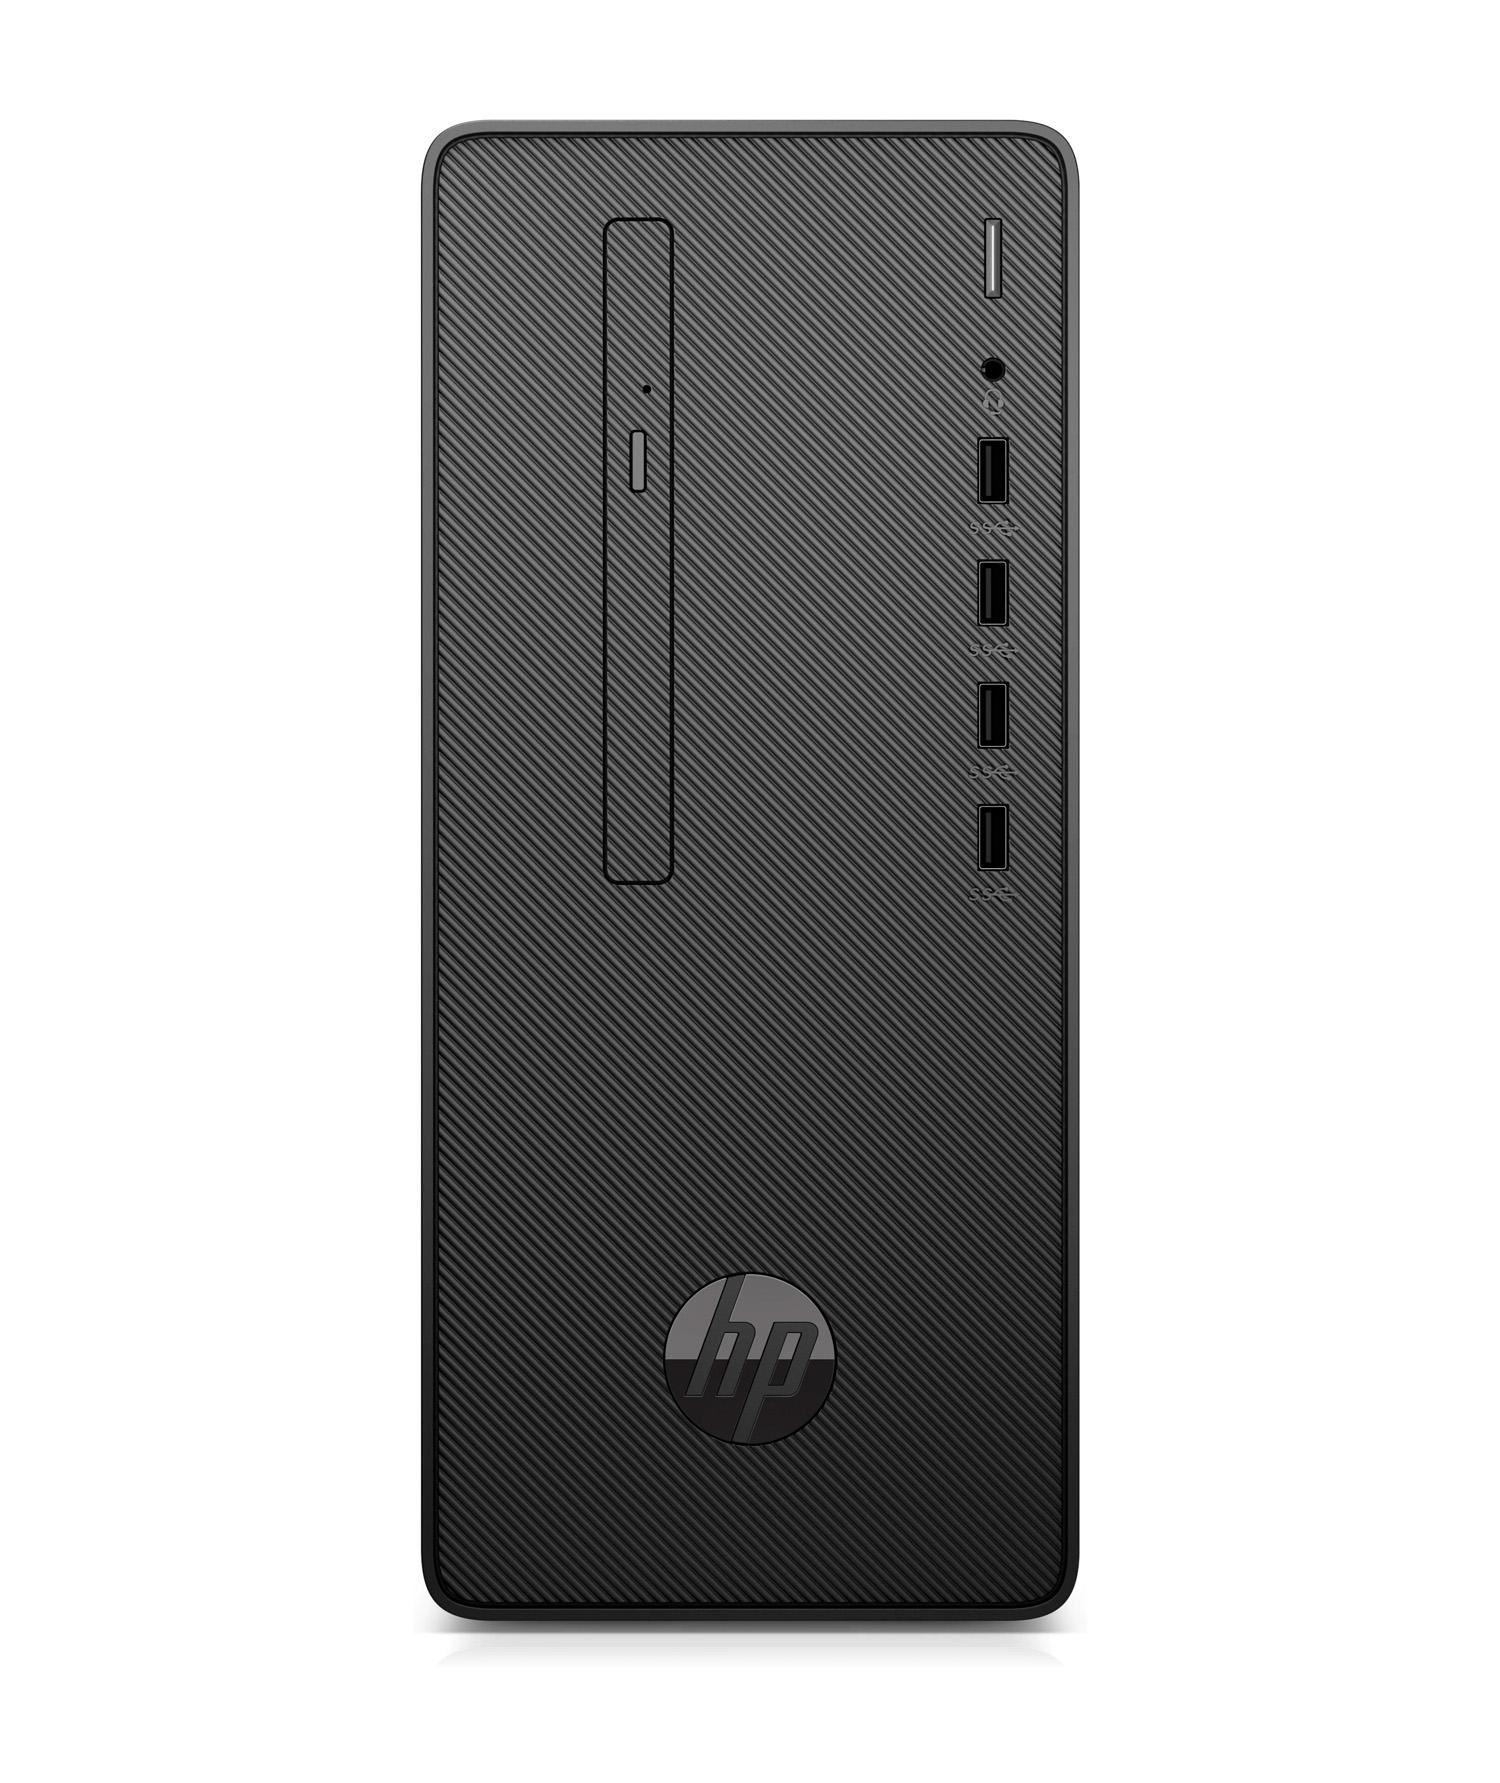 HP Desktop Pro G2 Micro tower 8DX29PA  Intel Core i3-9100 4GB DDR4 1TB DOS HP 18.5inch Monitor